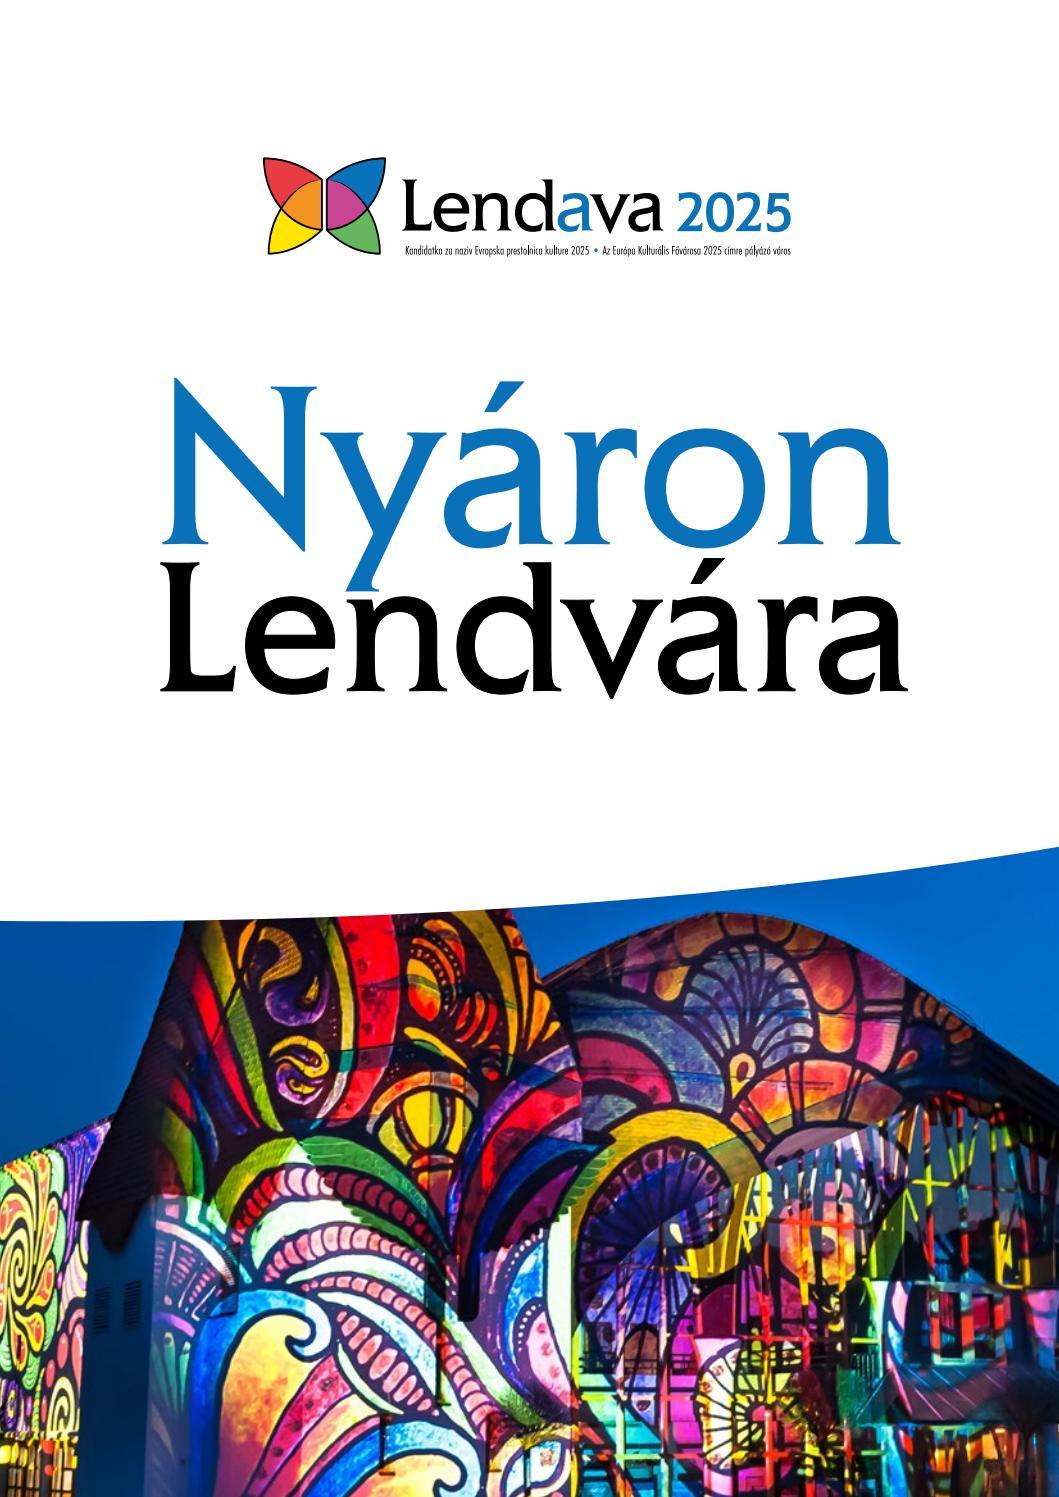 Nyaron Lendvara 2018 By Peter Orban Issuu